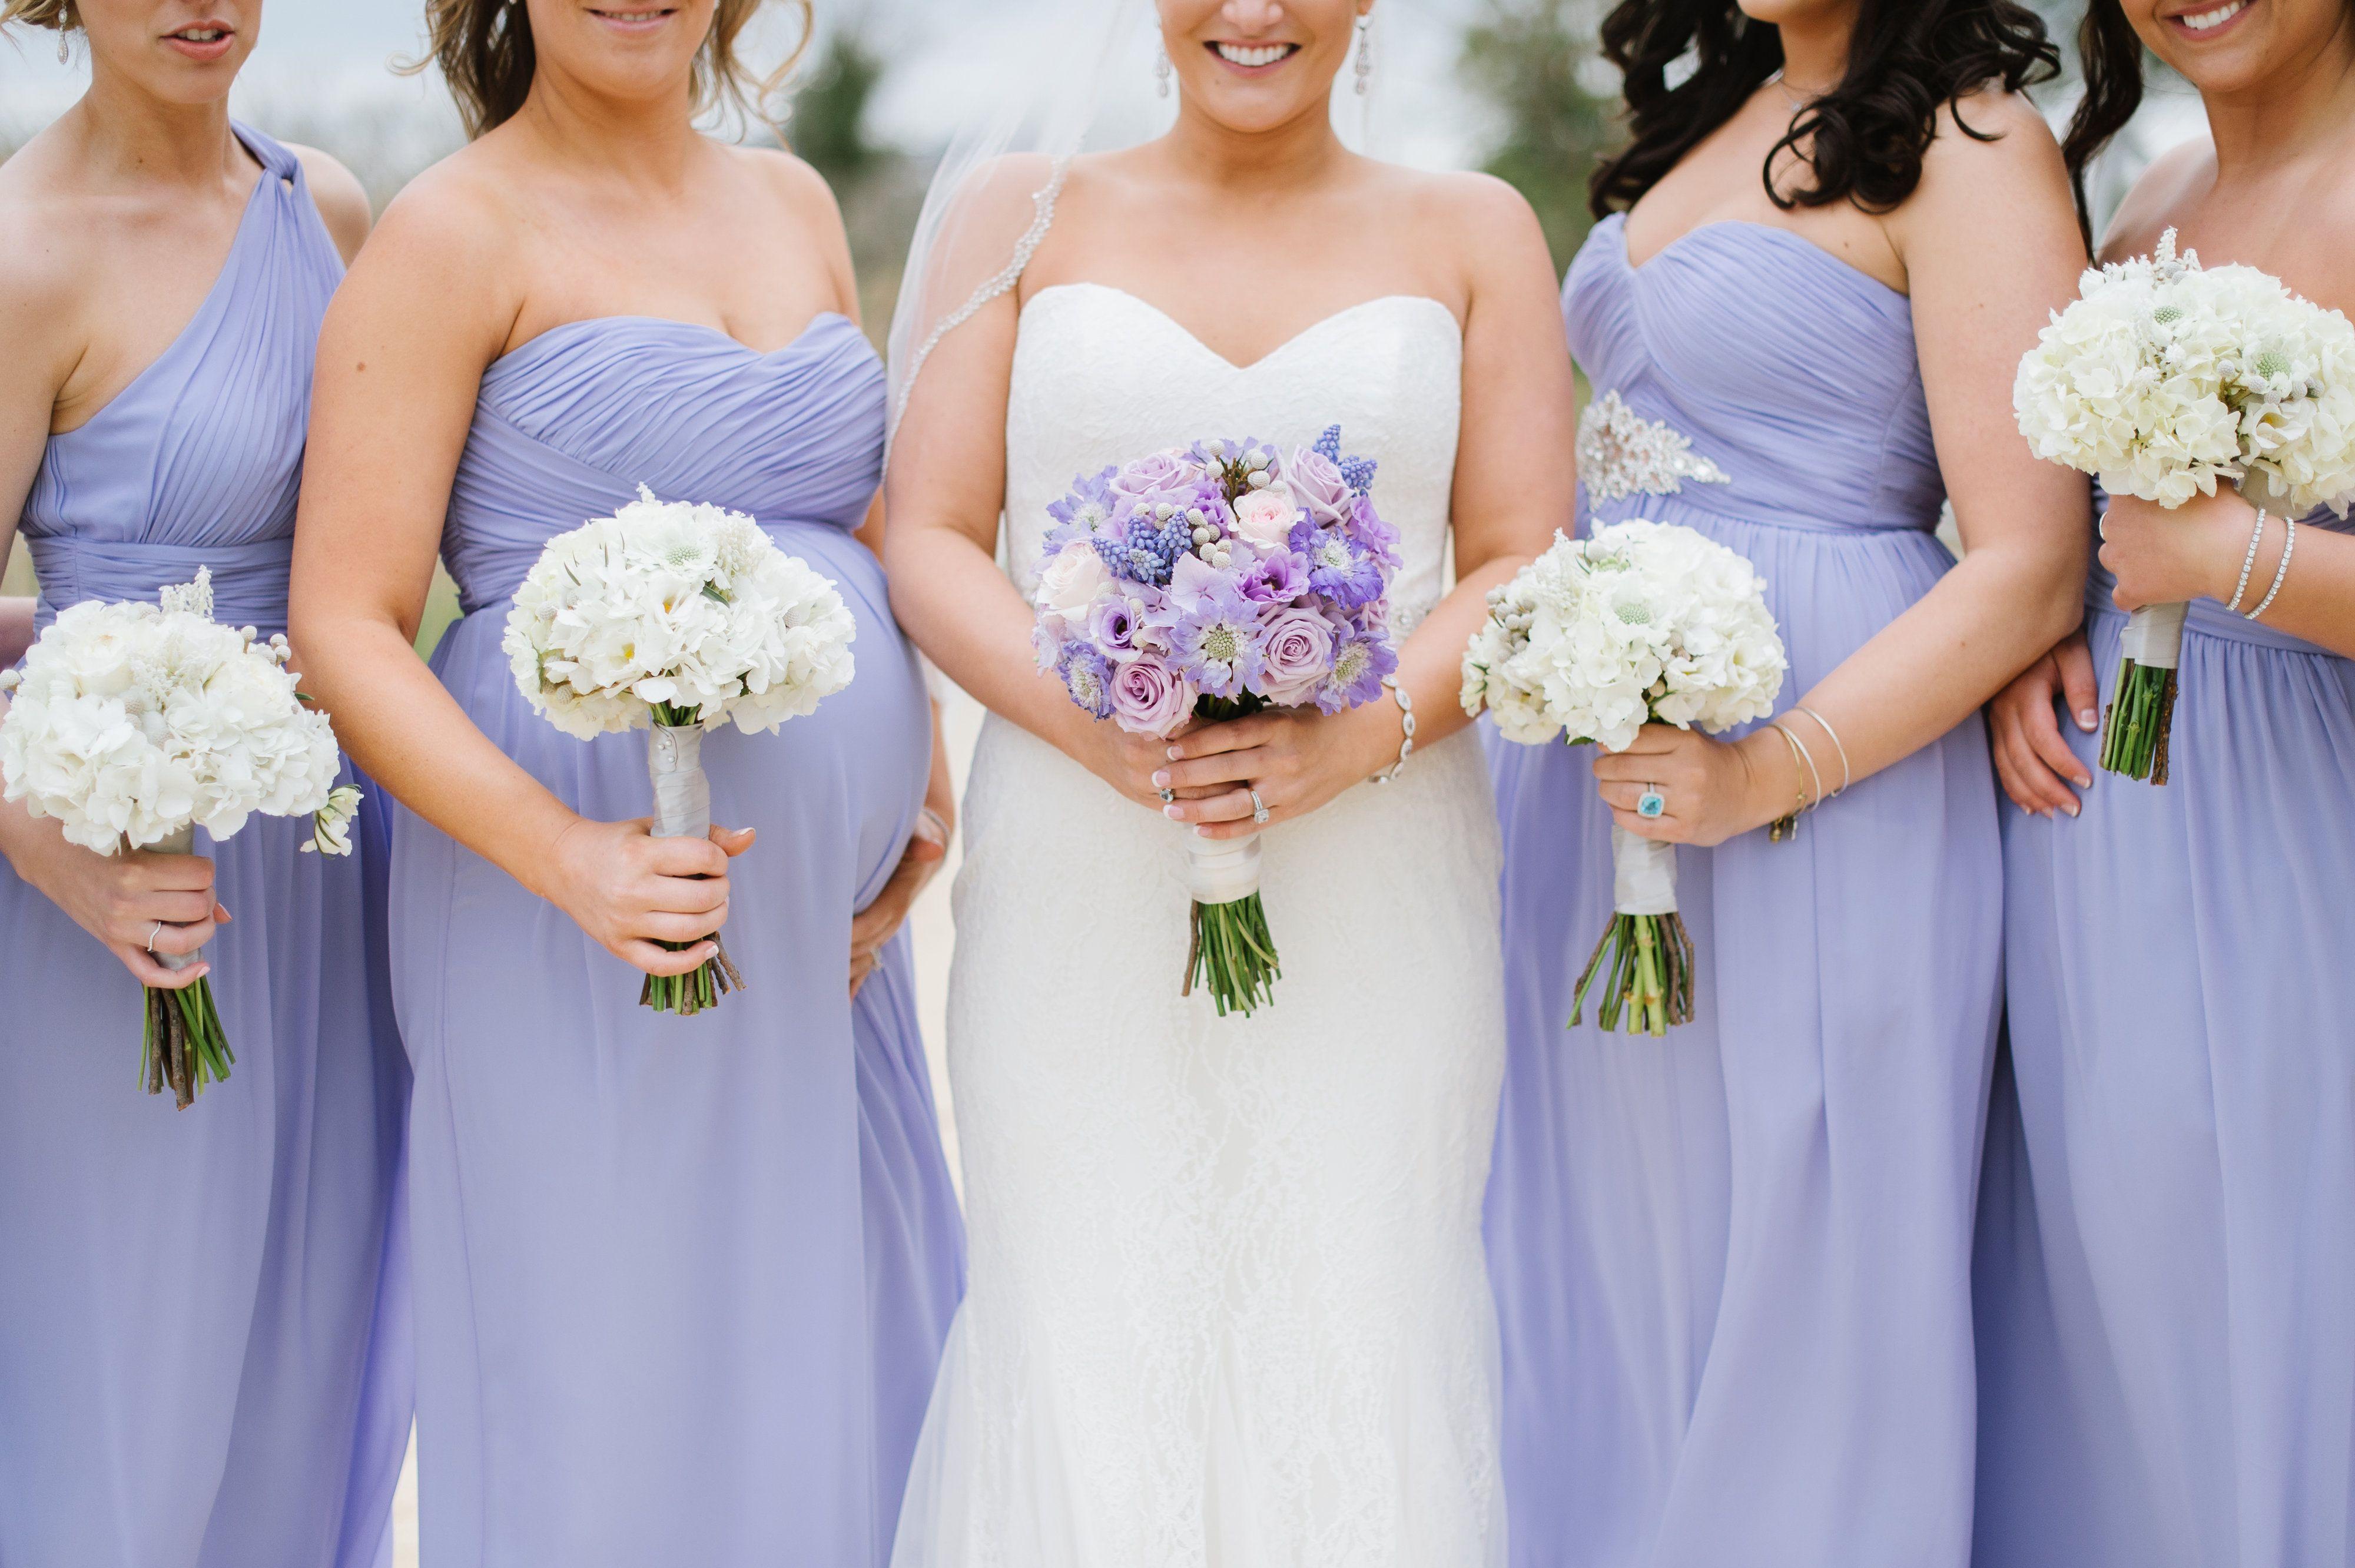 Donna Morgan Iris Bridesmaid Dresses Wedding Purple Bridesmaids